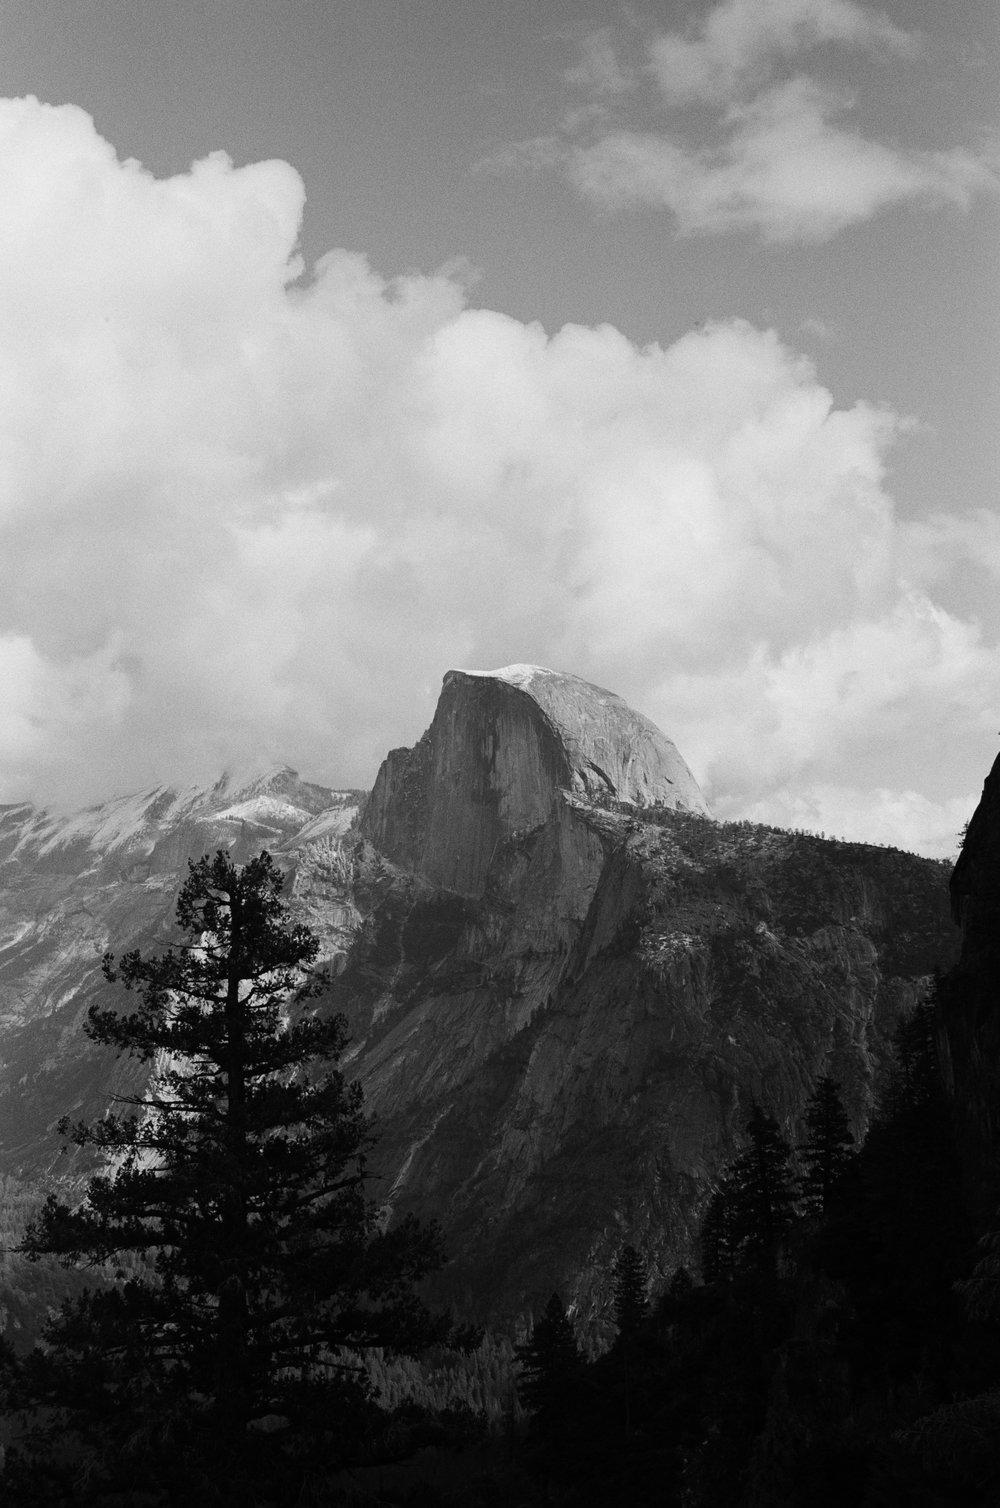 Yosemite National Park, California - 2015